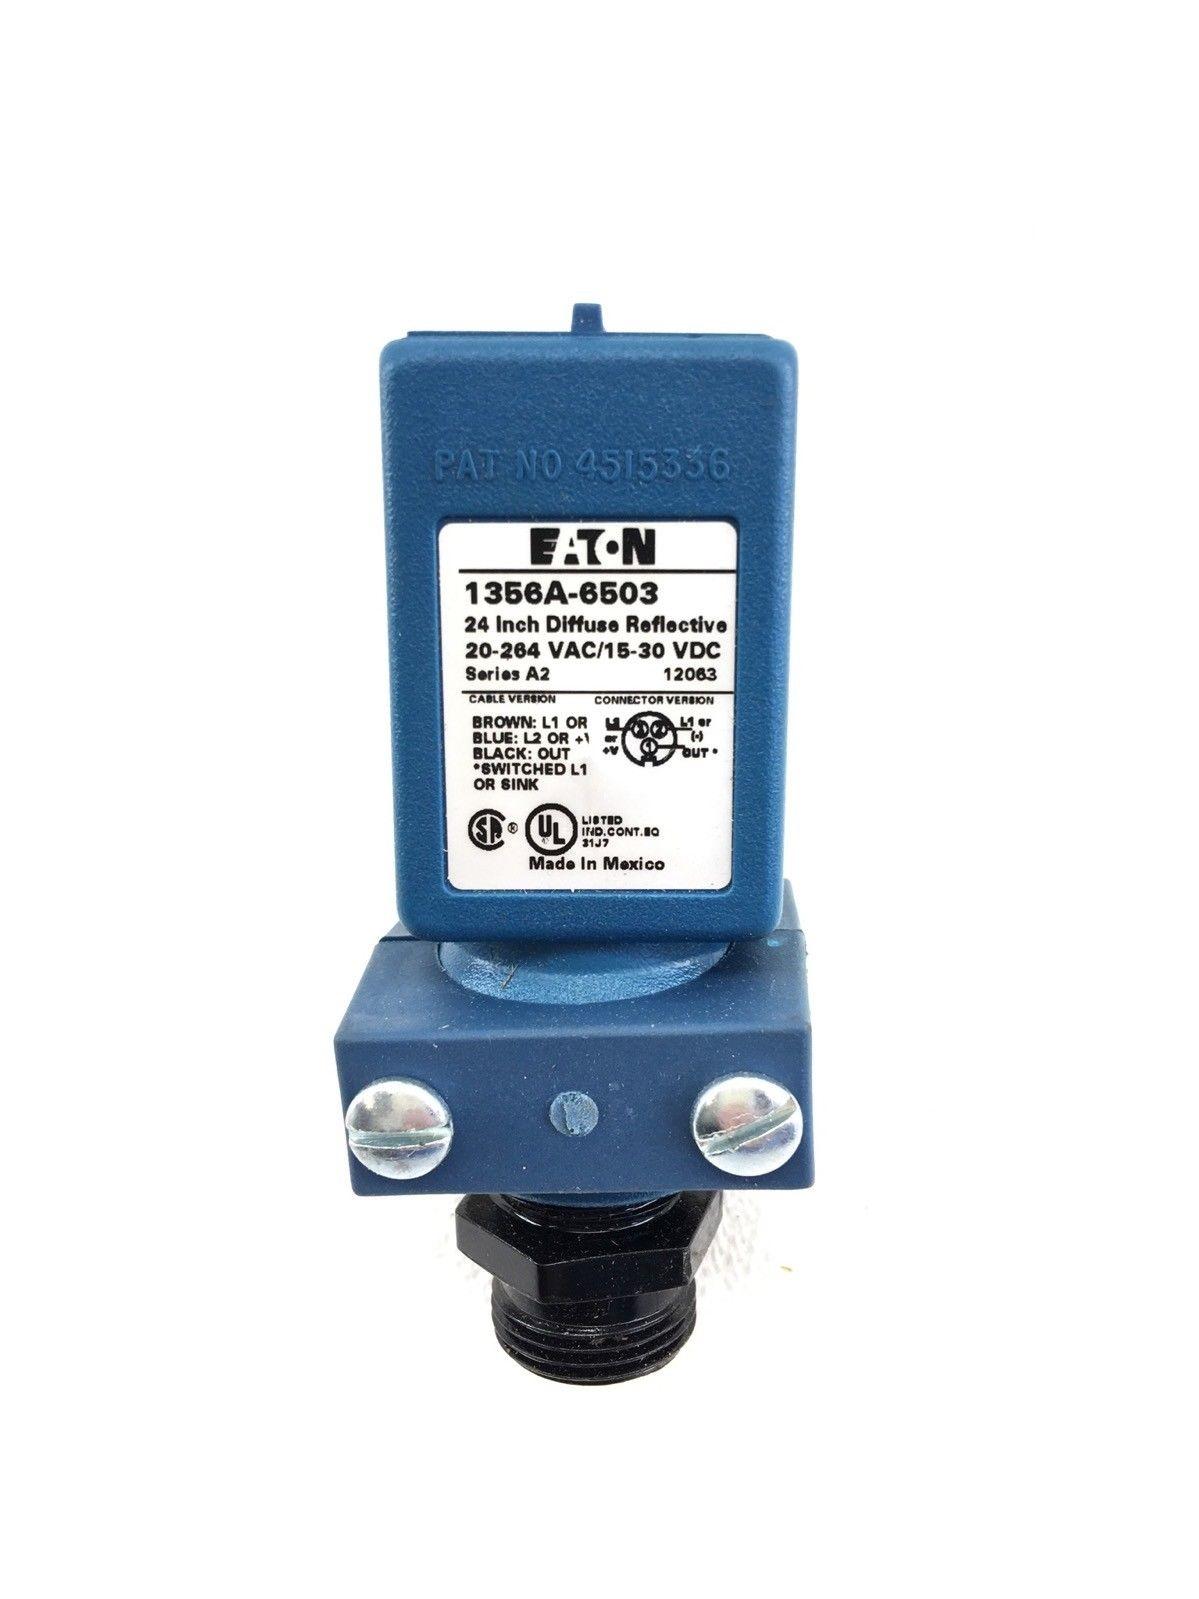 NEW EATONÂ 1356A-6503 24 INCH DIFFUSE REFLECTIVE, 20-264 VAC, 15-30 VDC, (A594) 2